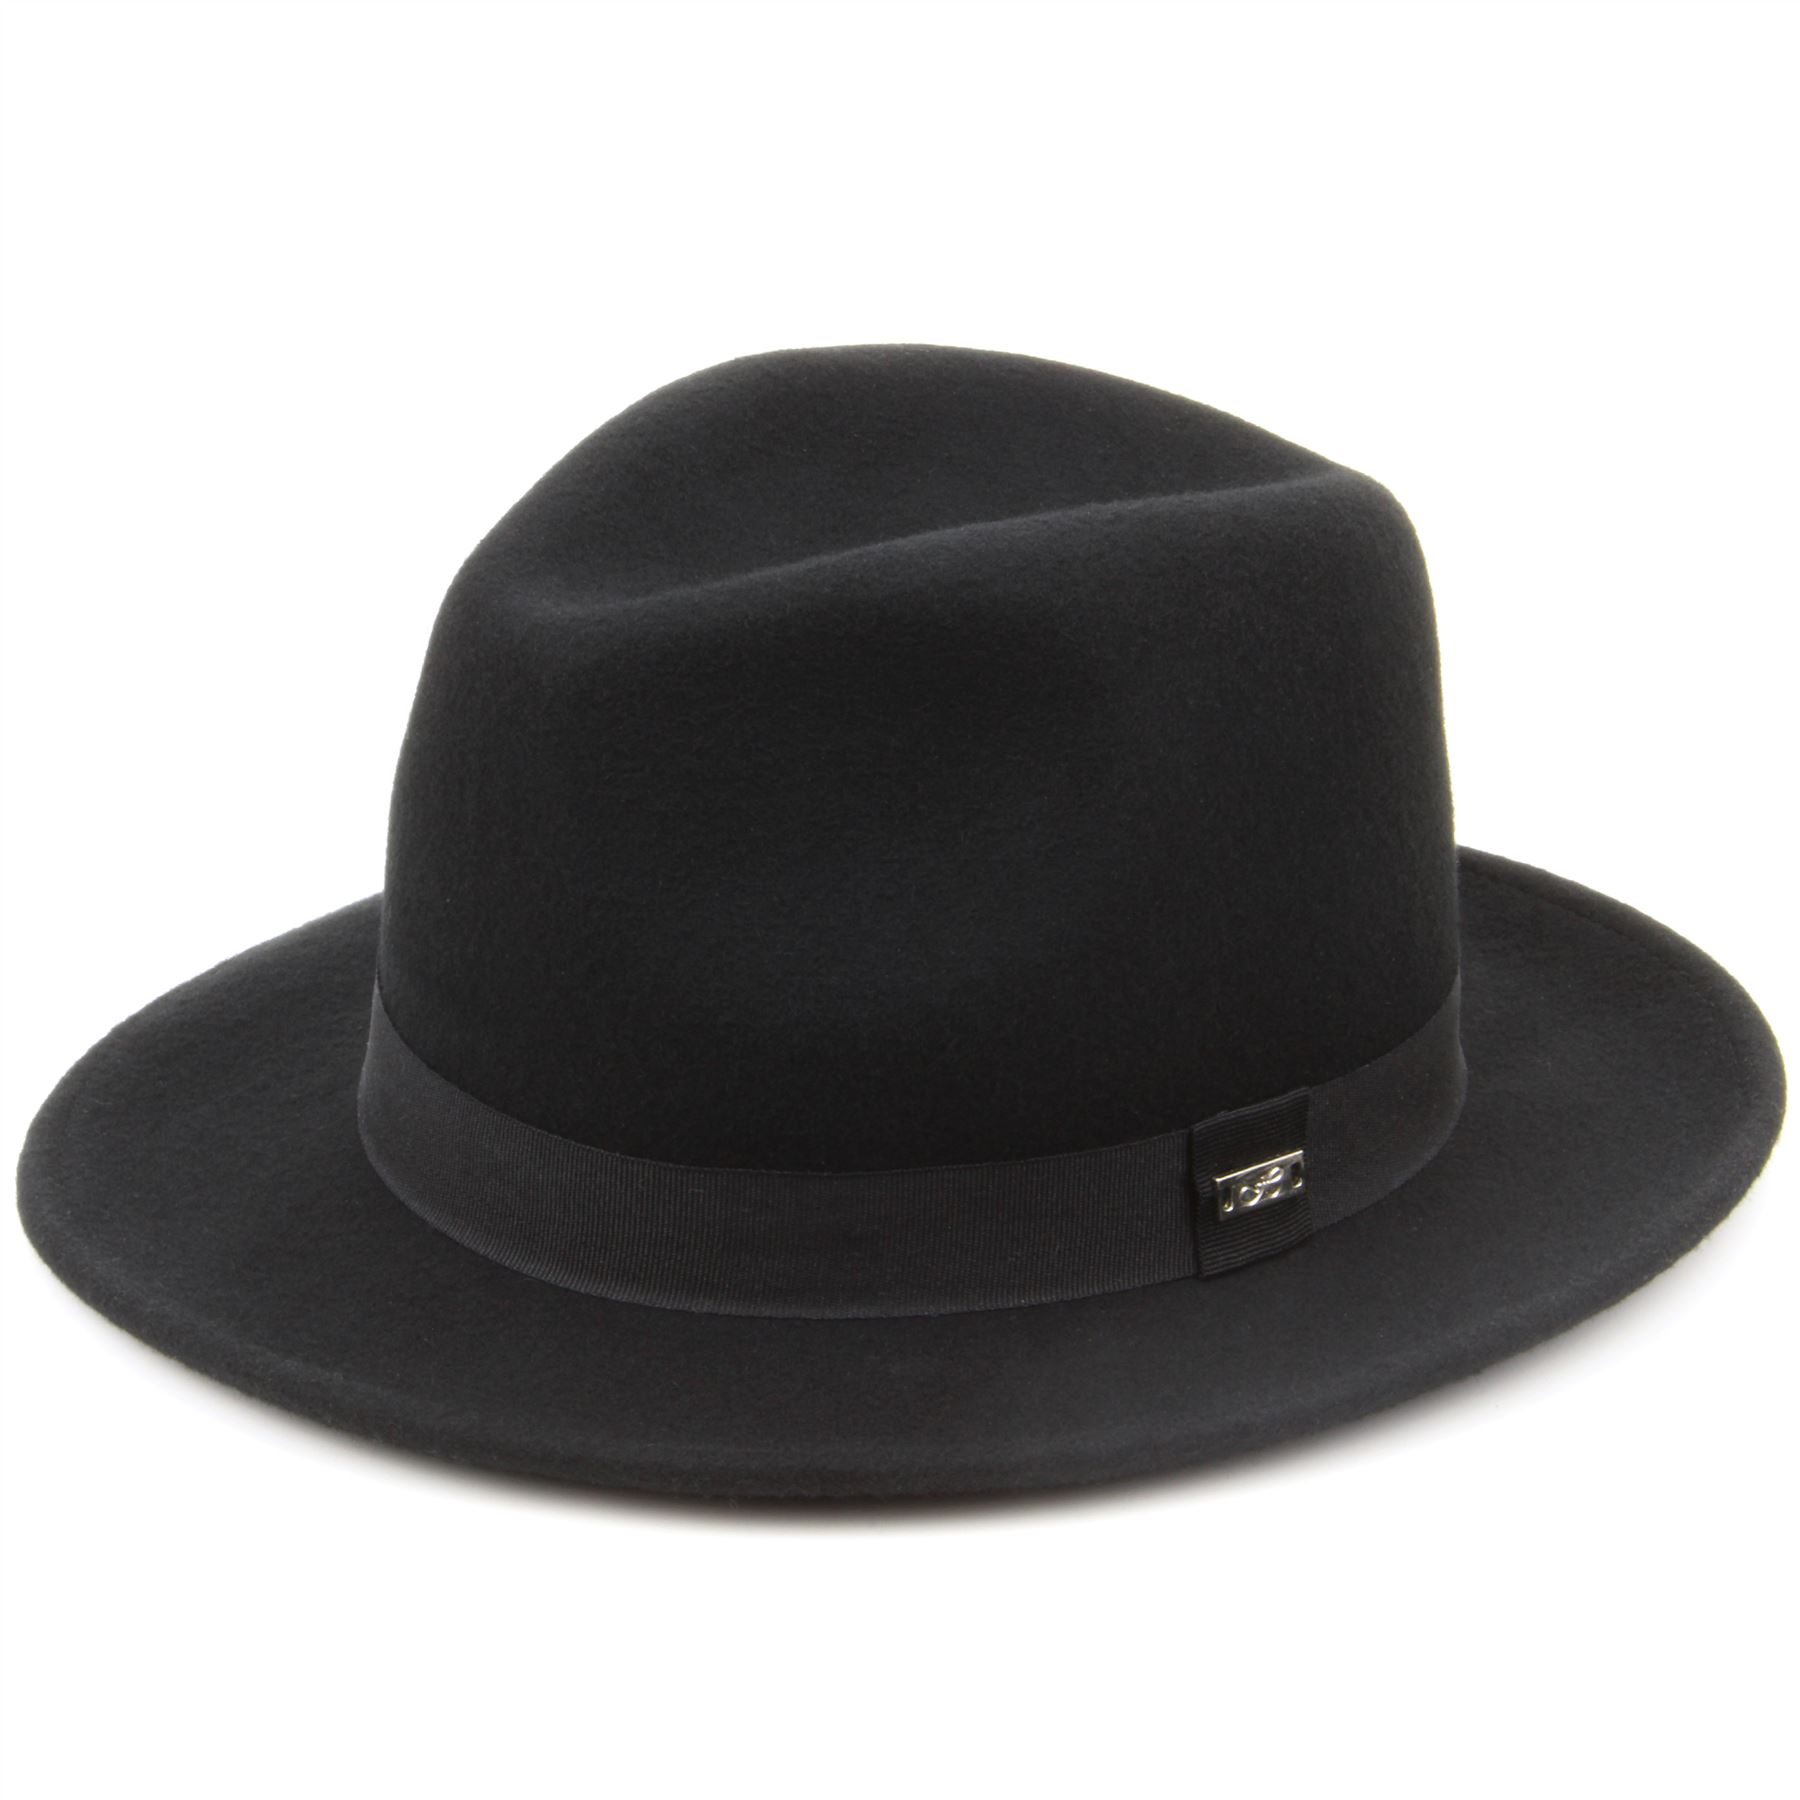 Sombrero Fedora Borsalino Negro Hawkins Gorra Fieltro De Lana Hombre ... 2216ee86105